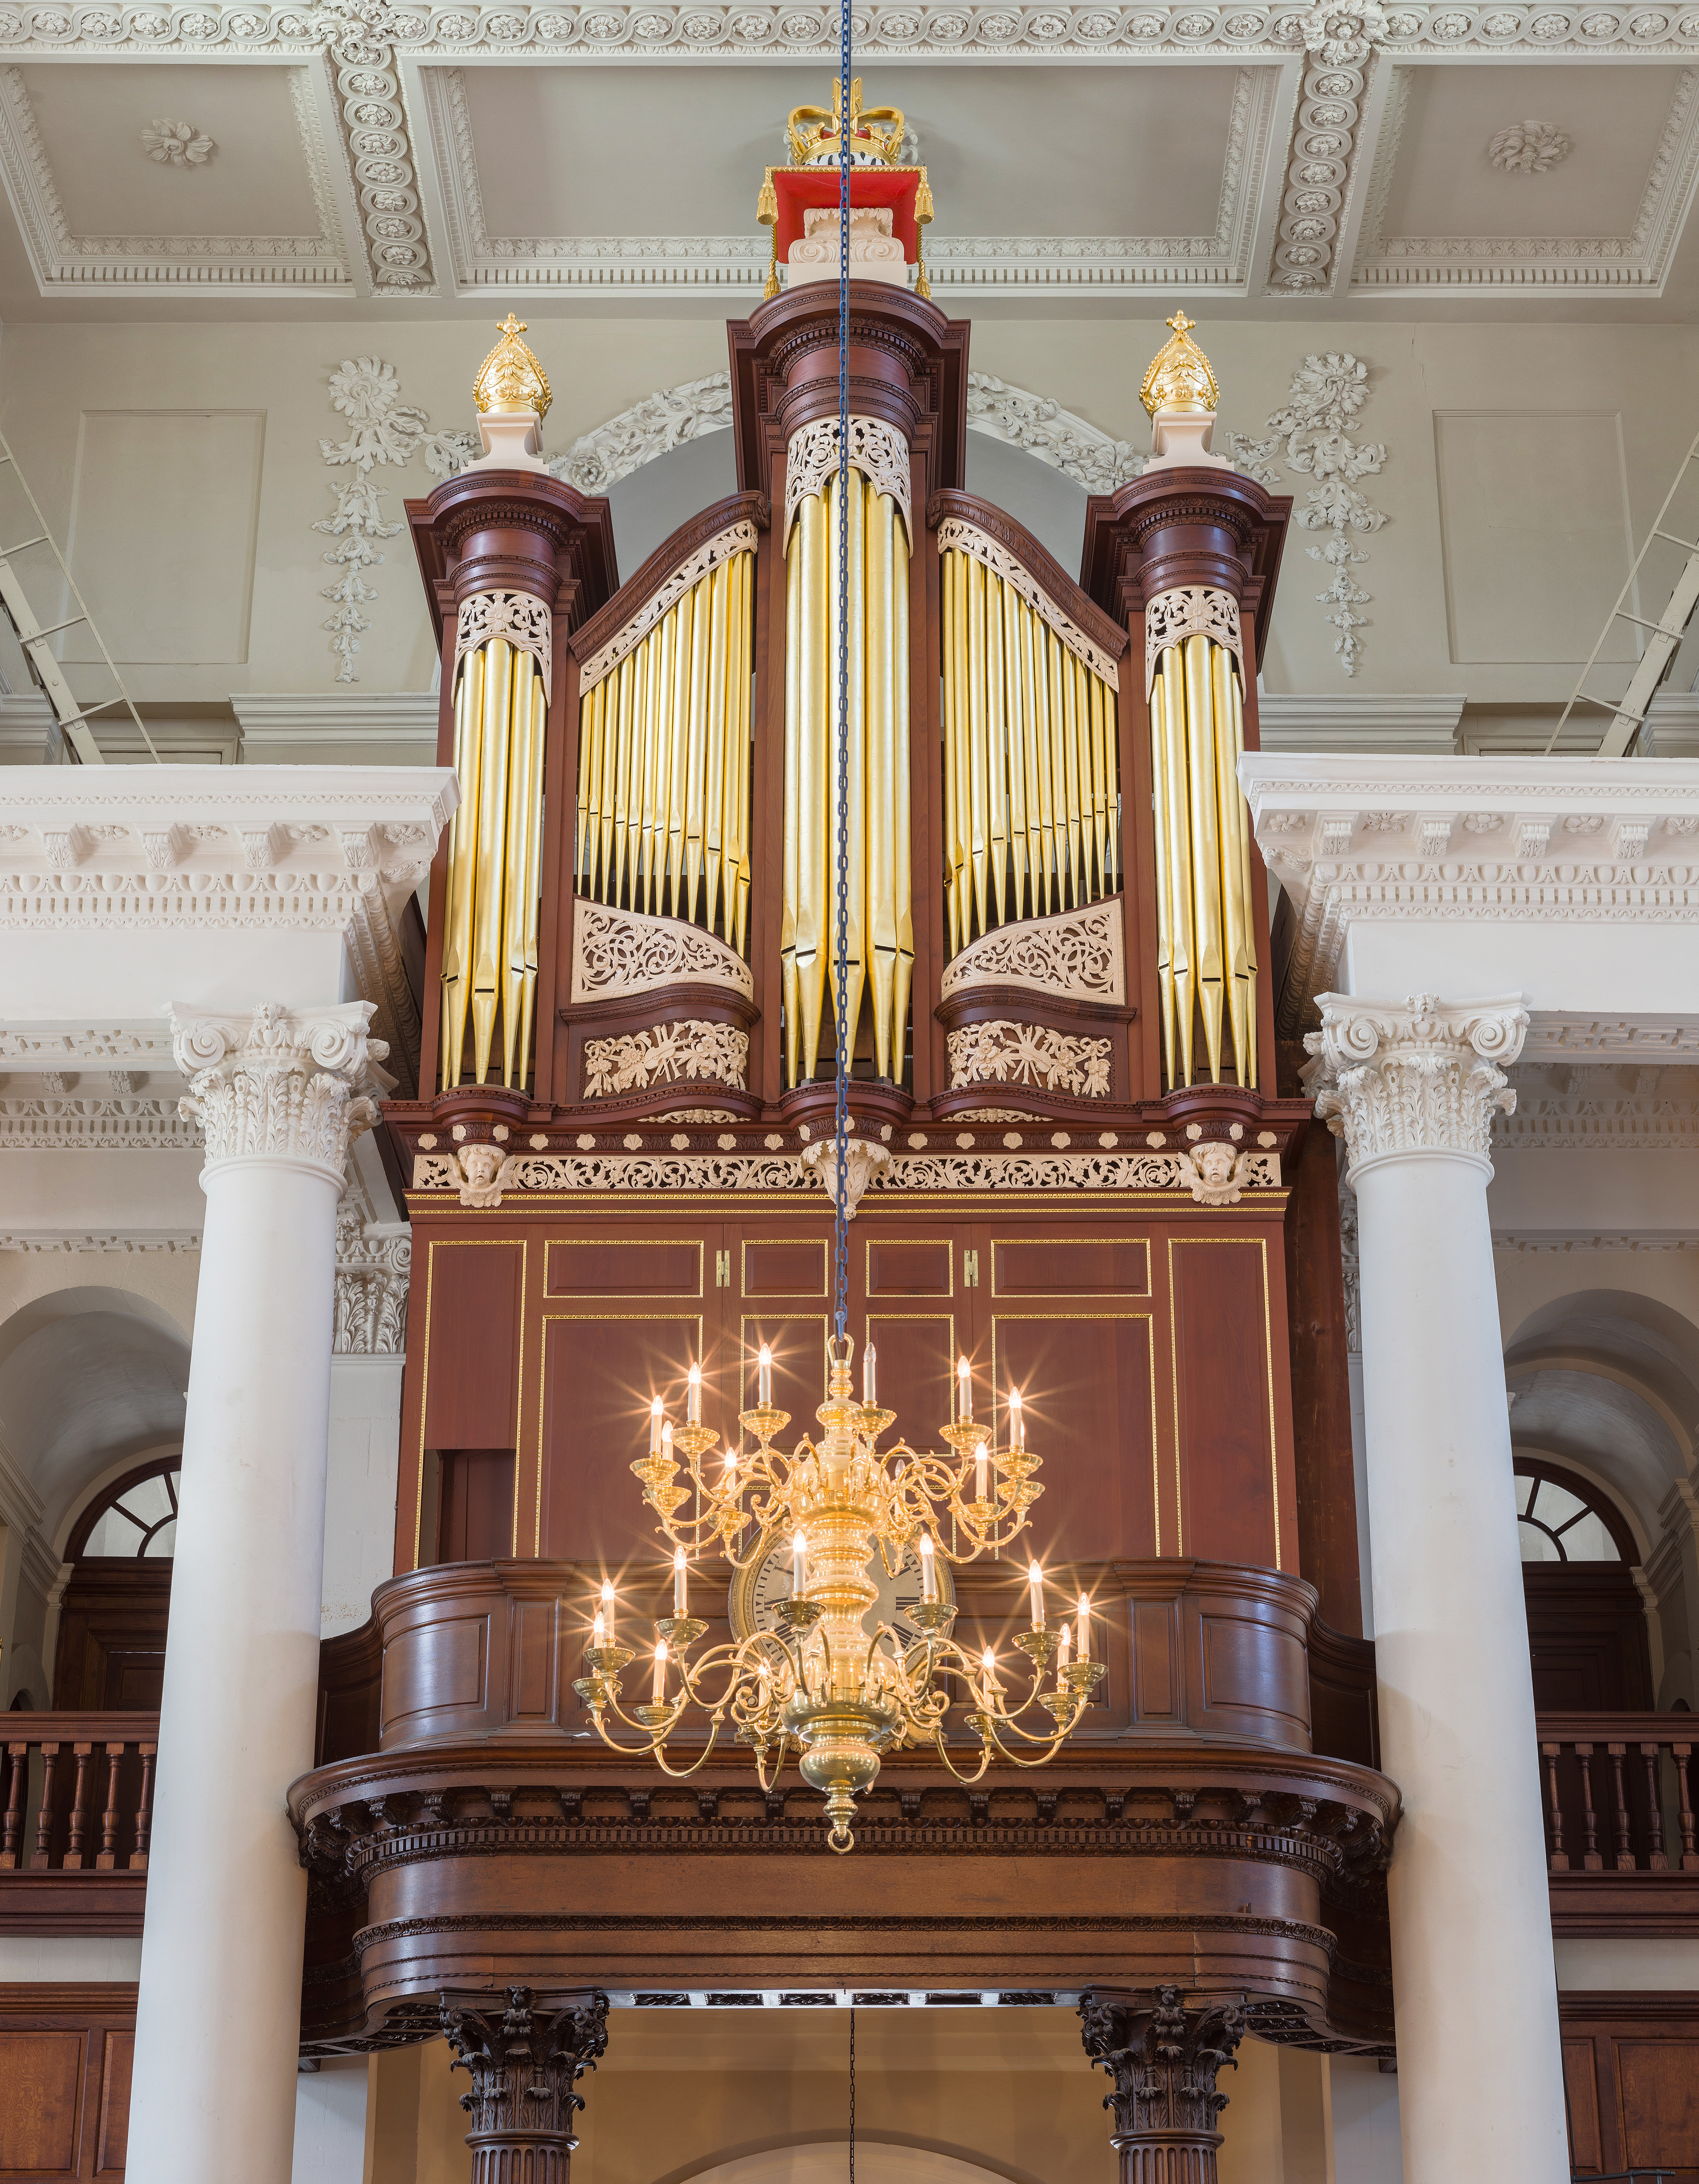 Spitalfields London: File:Christ Church, Spitalfields Organ, London, UK